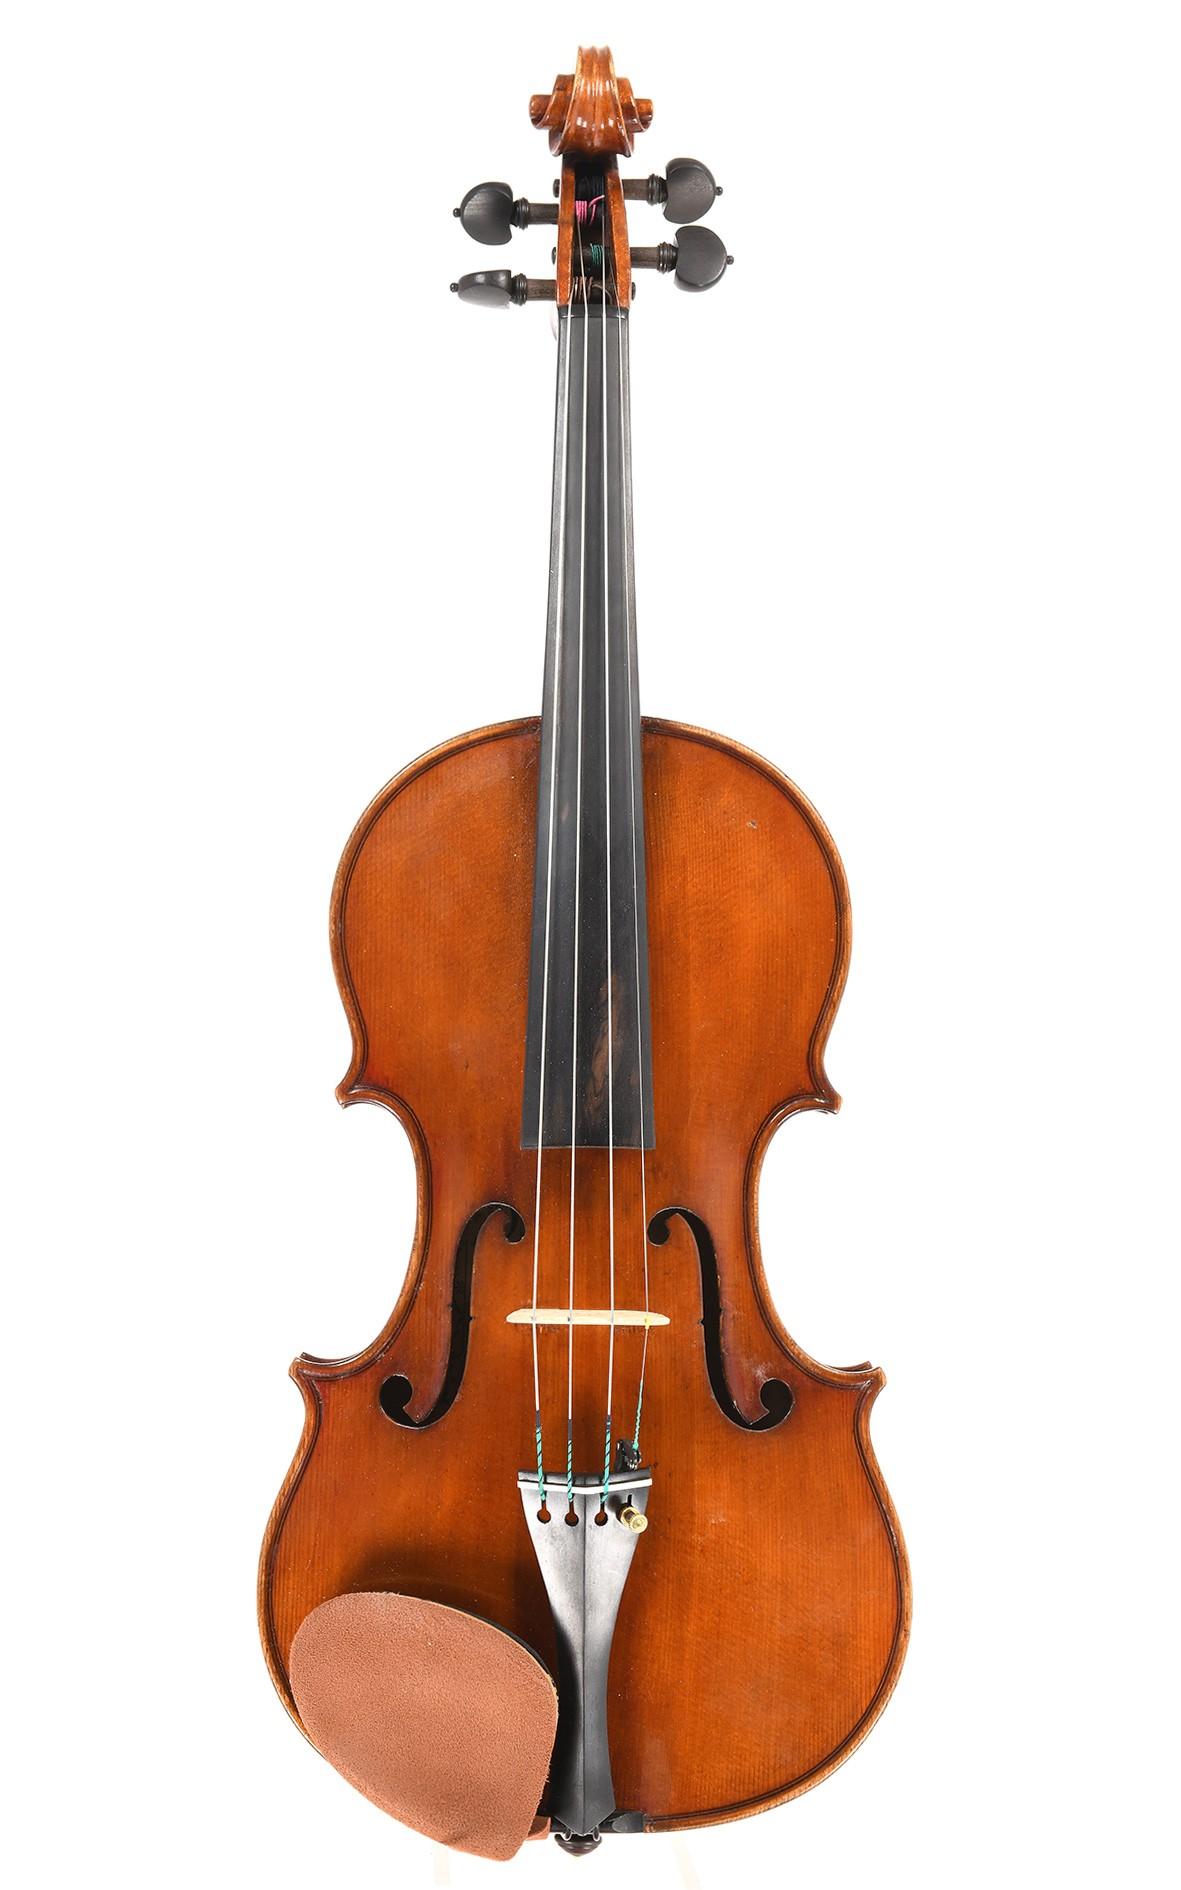 Giuseppe Pedrazzini, feine italienische Violine aus dem Jahr 1950